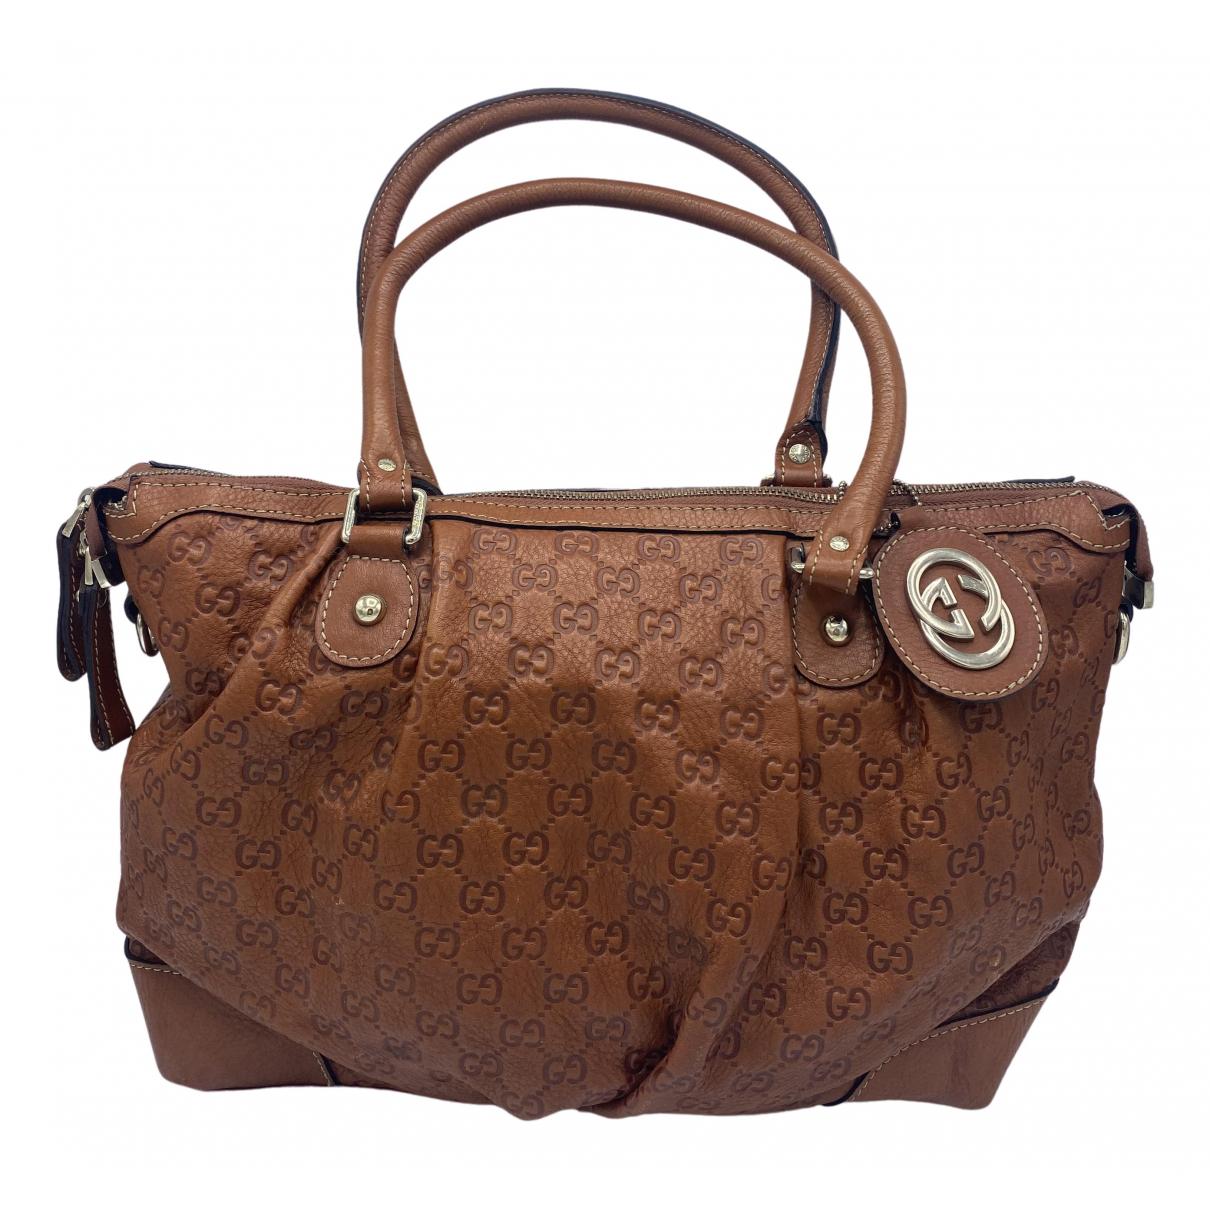 Gucci - Sac a main   pour femme en cuir - marron